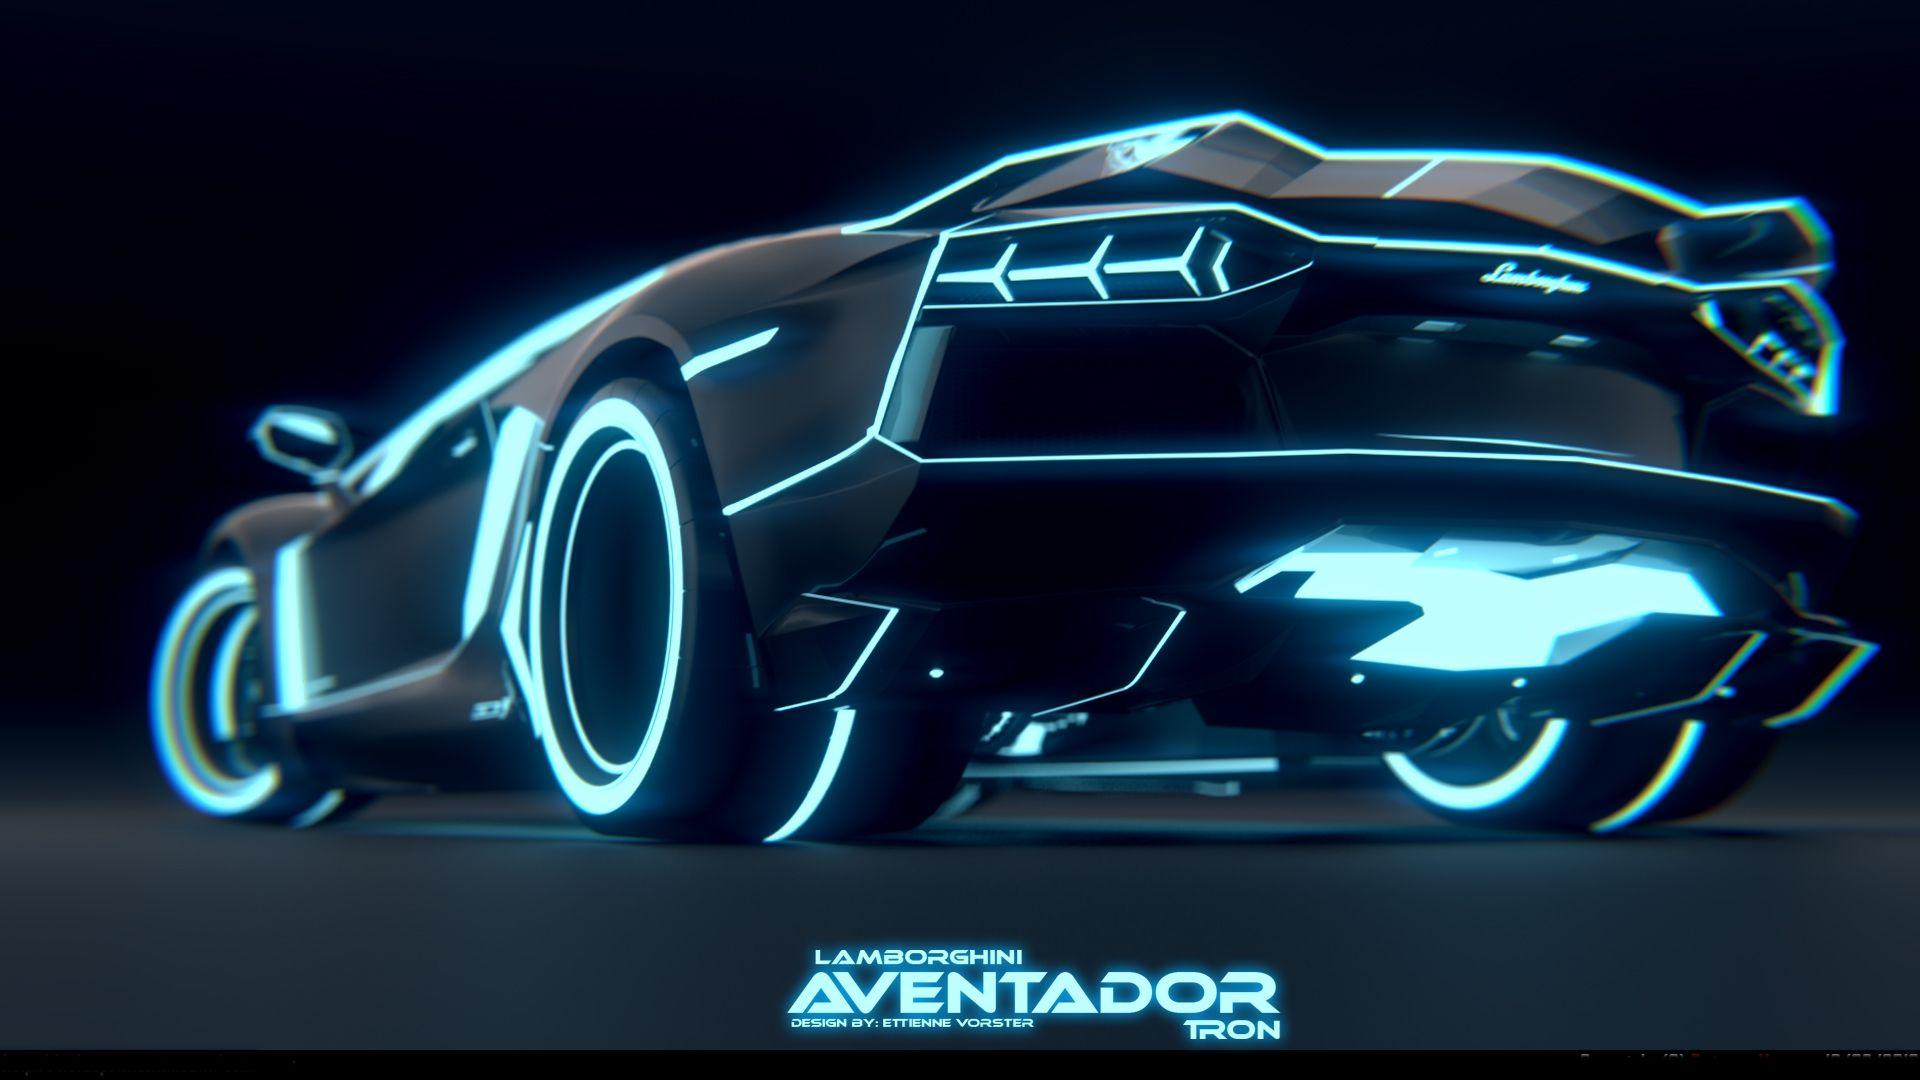 Tron Lamborghini Black Red Car Wallpapers Hd Desktop: Dark Blue Tron Style Lamborghini Aventador